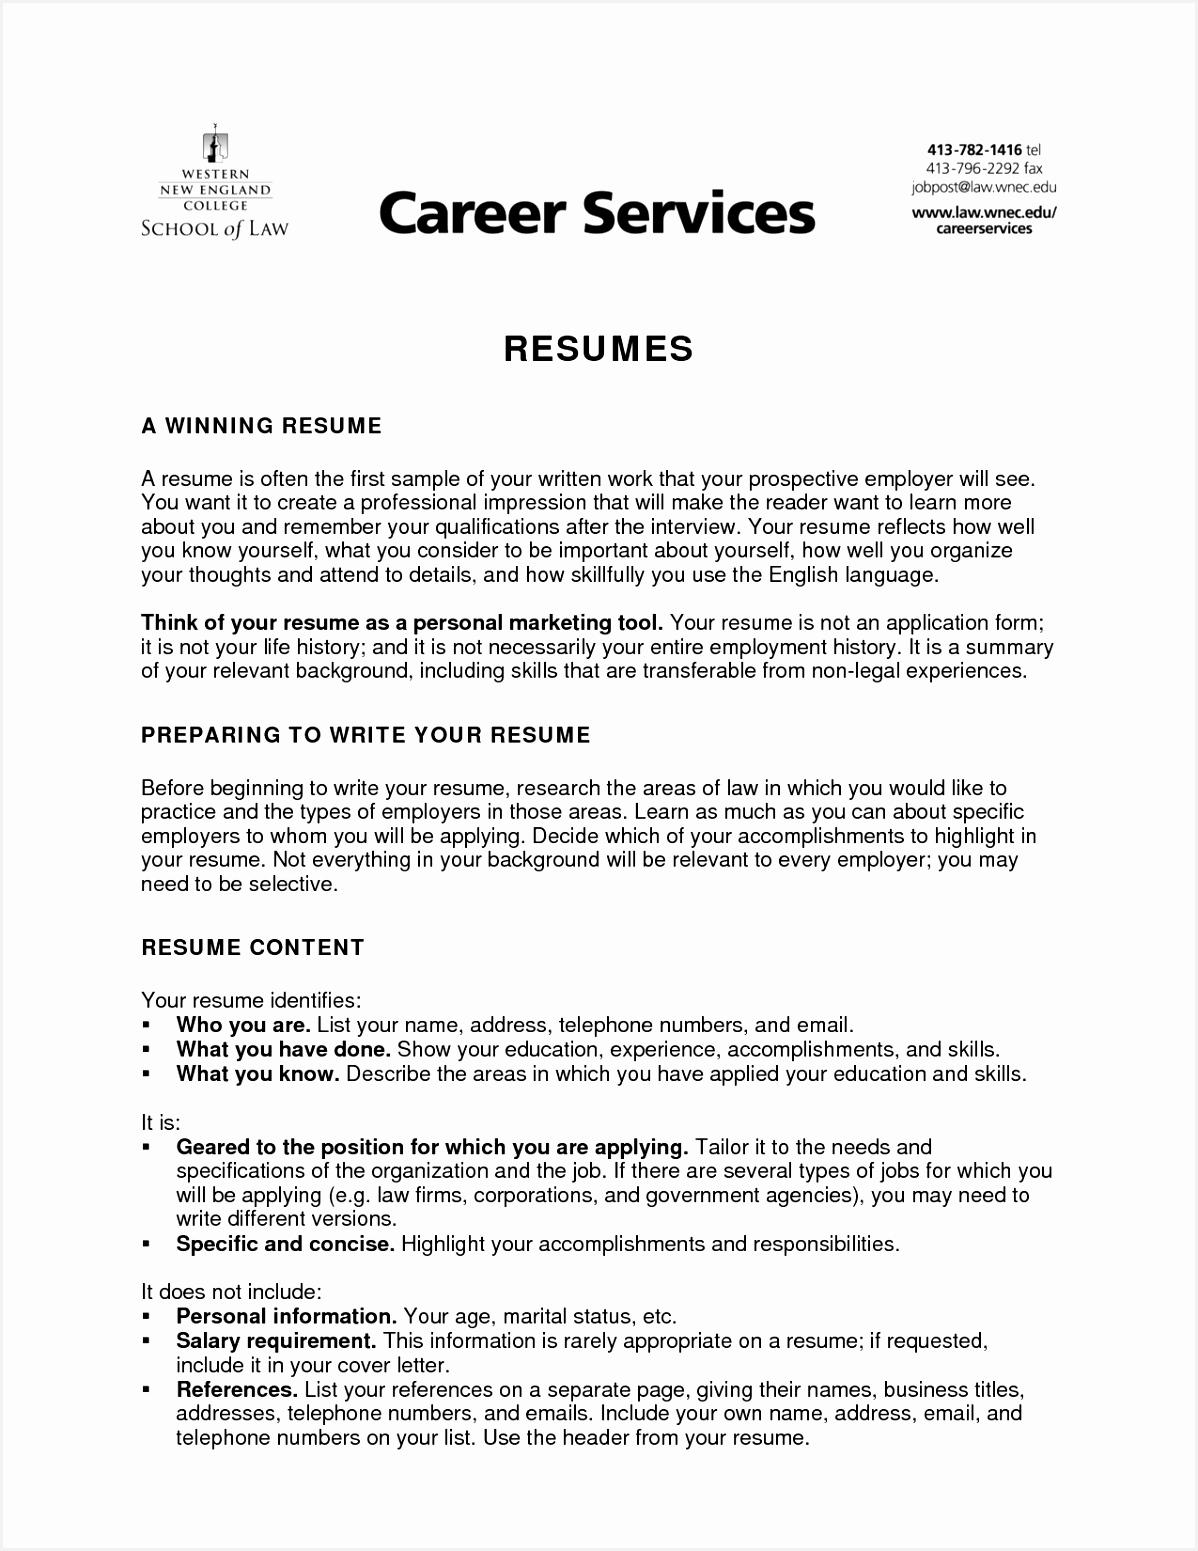 Nursing Resume Objective Examples Best Elegant Good Nursing Resume Elegant Nurse Resume 0d Wallpapers 42 155111983vkyq